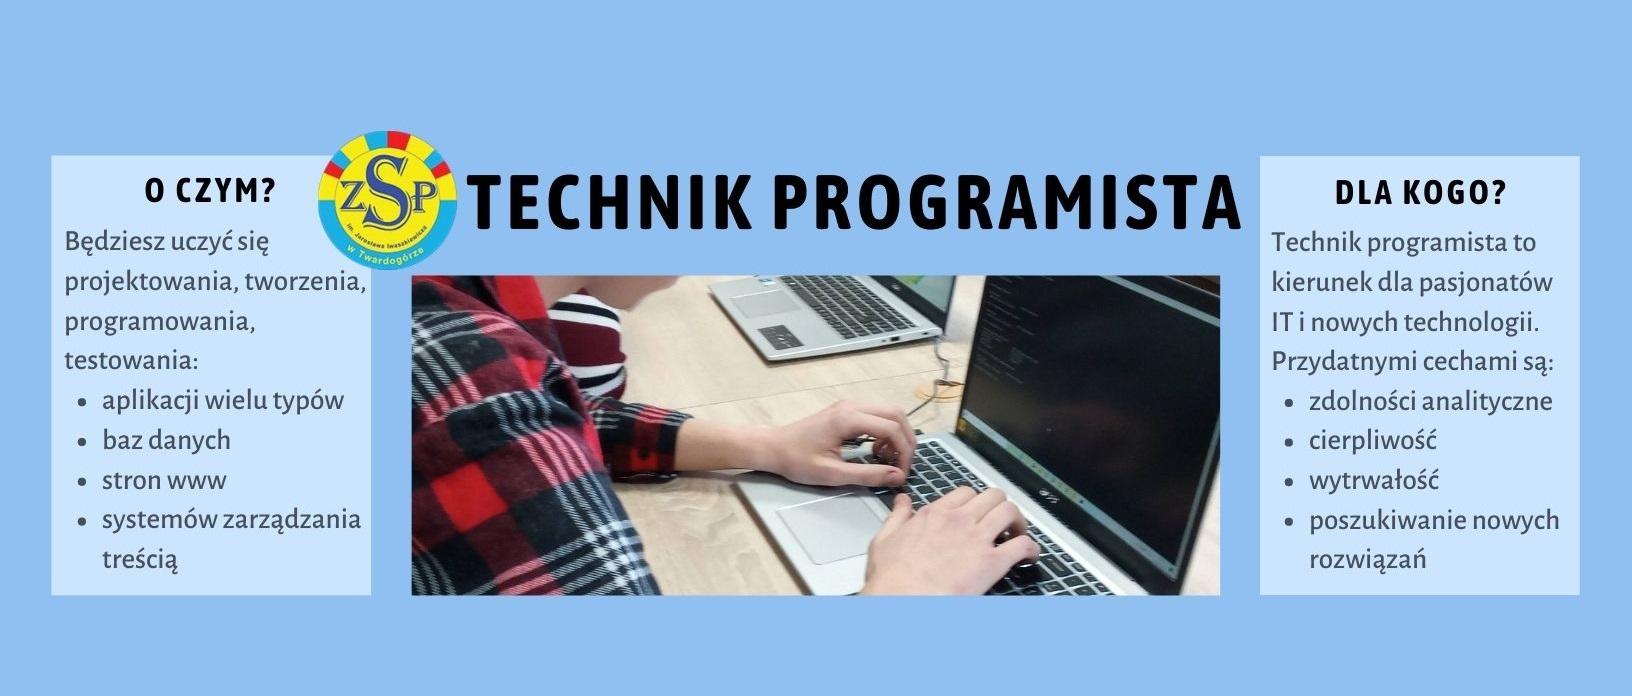 Technik programista – rekrutacja 2021